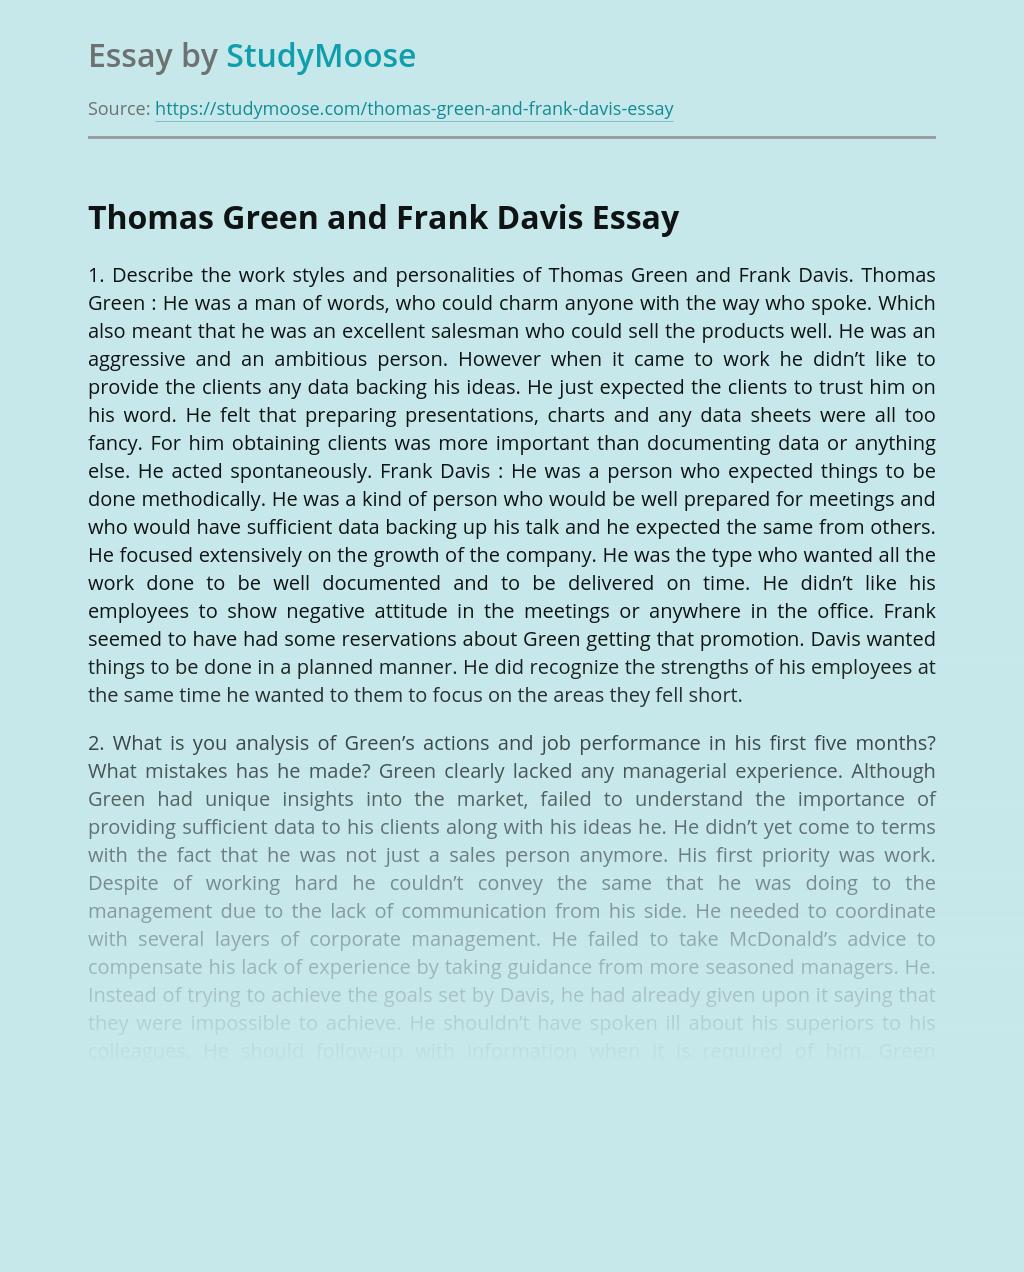 Thomas Green and Frank Davis